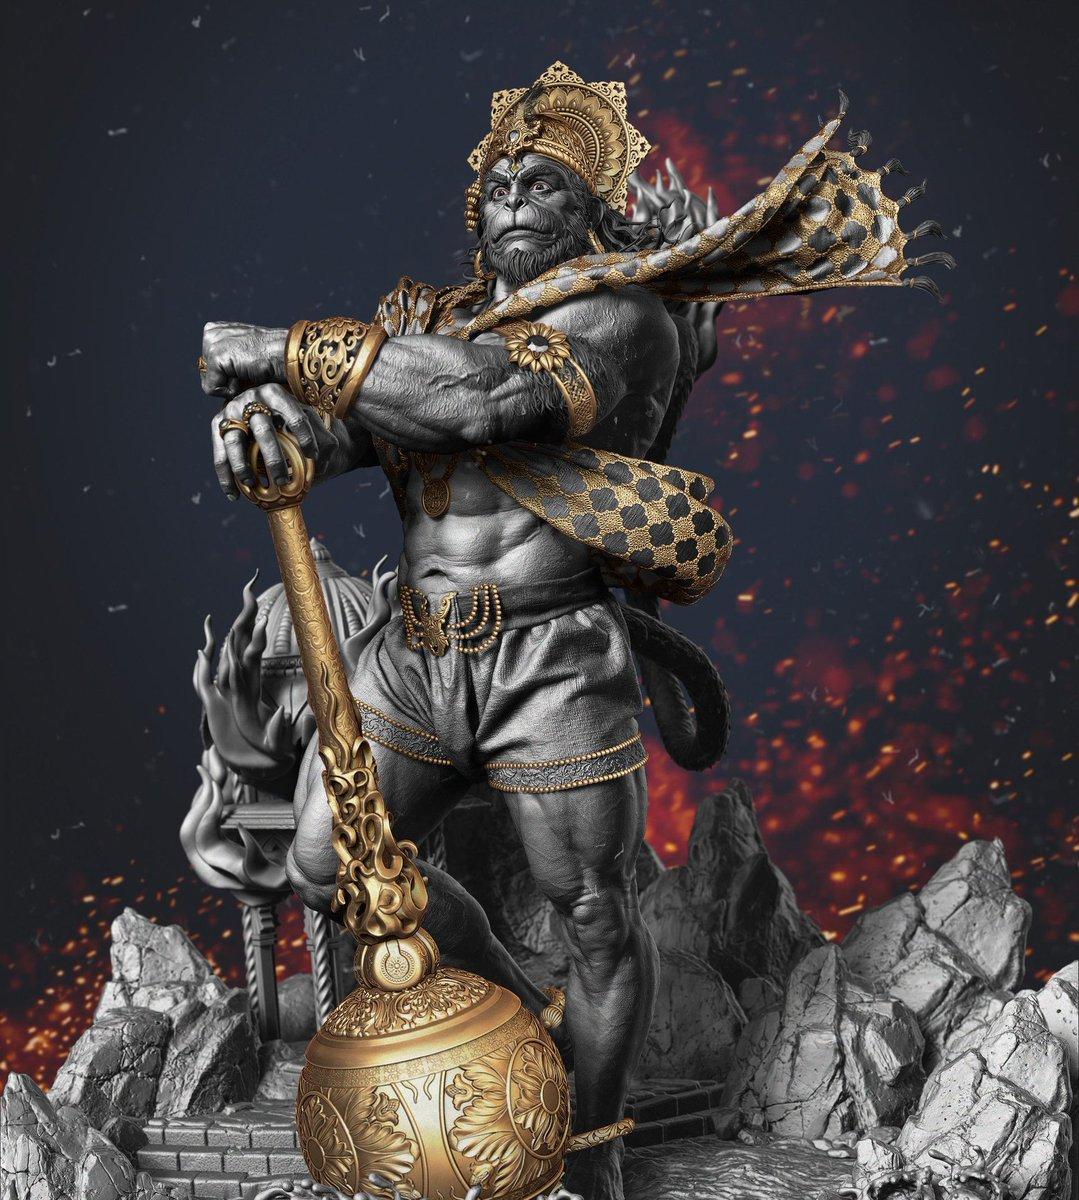 Veer Hanuman Angry Images Wallpaper Hd Quality Angry Hanuman Hd Wallpaper 1080p Bhagwan Ki Photo